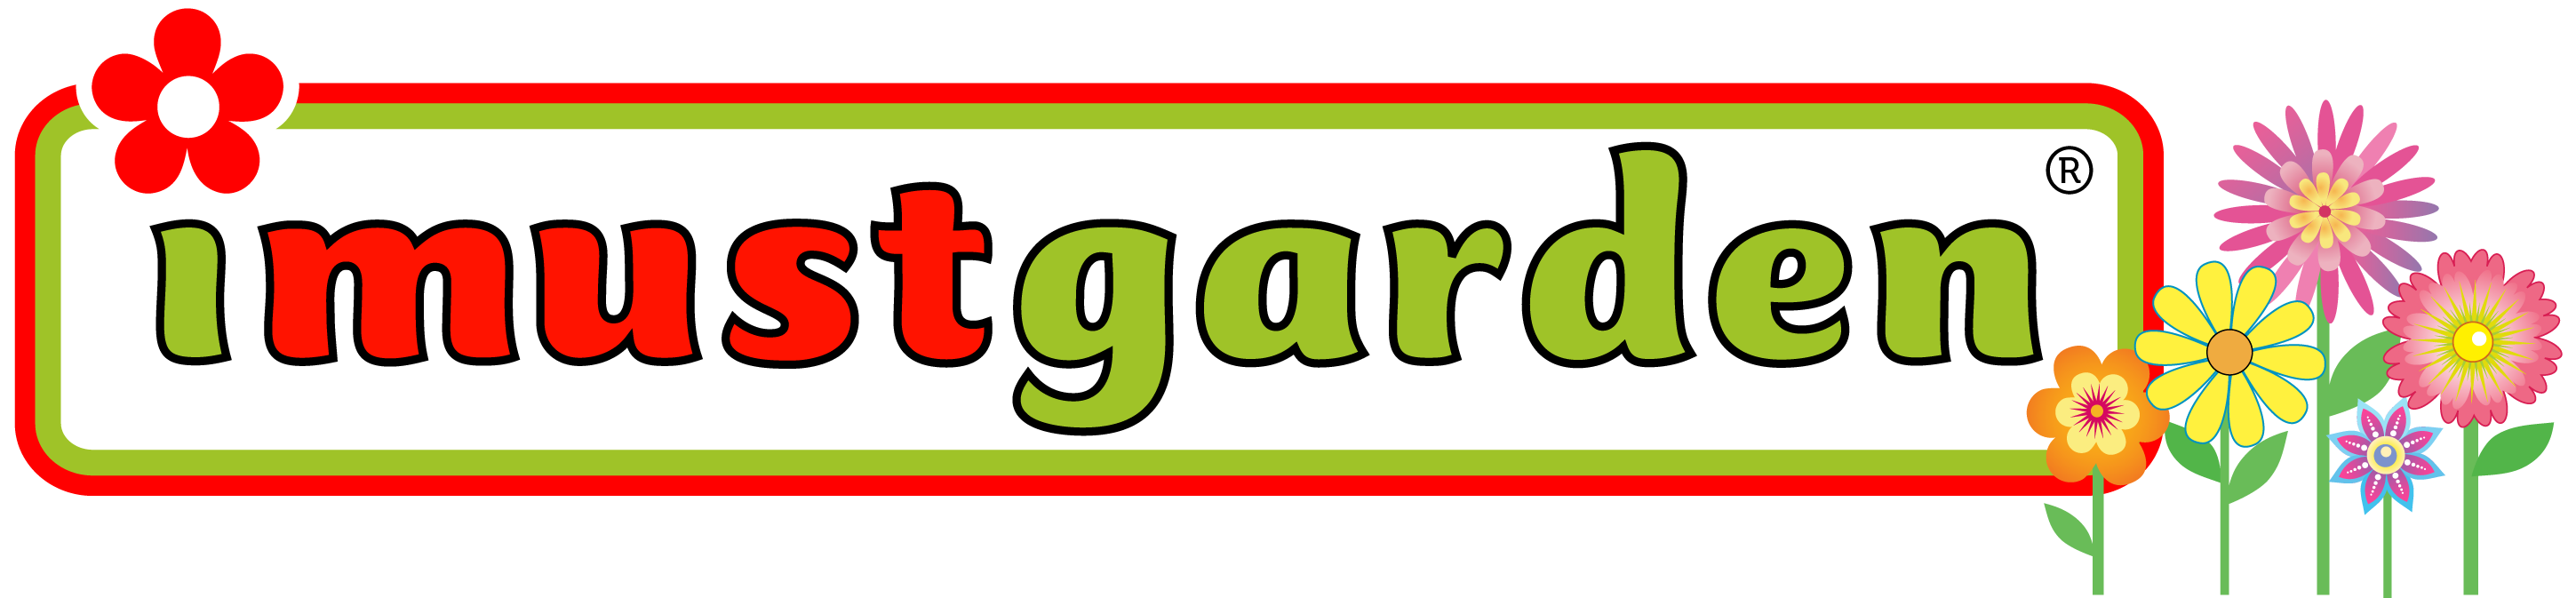 I Must Garden Gardening Logo